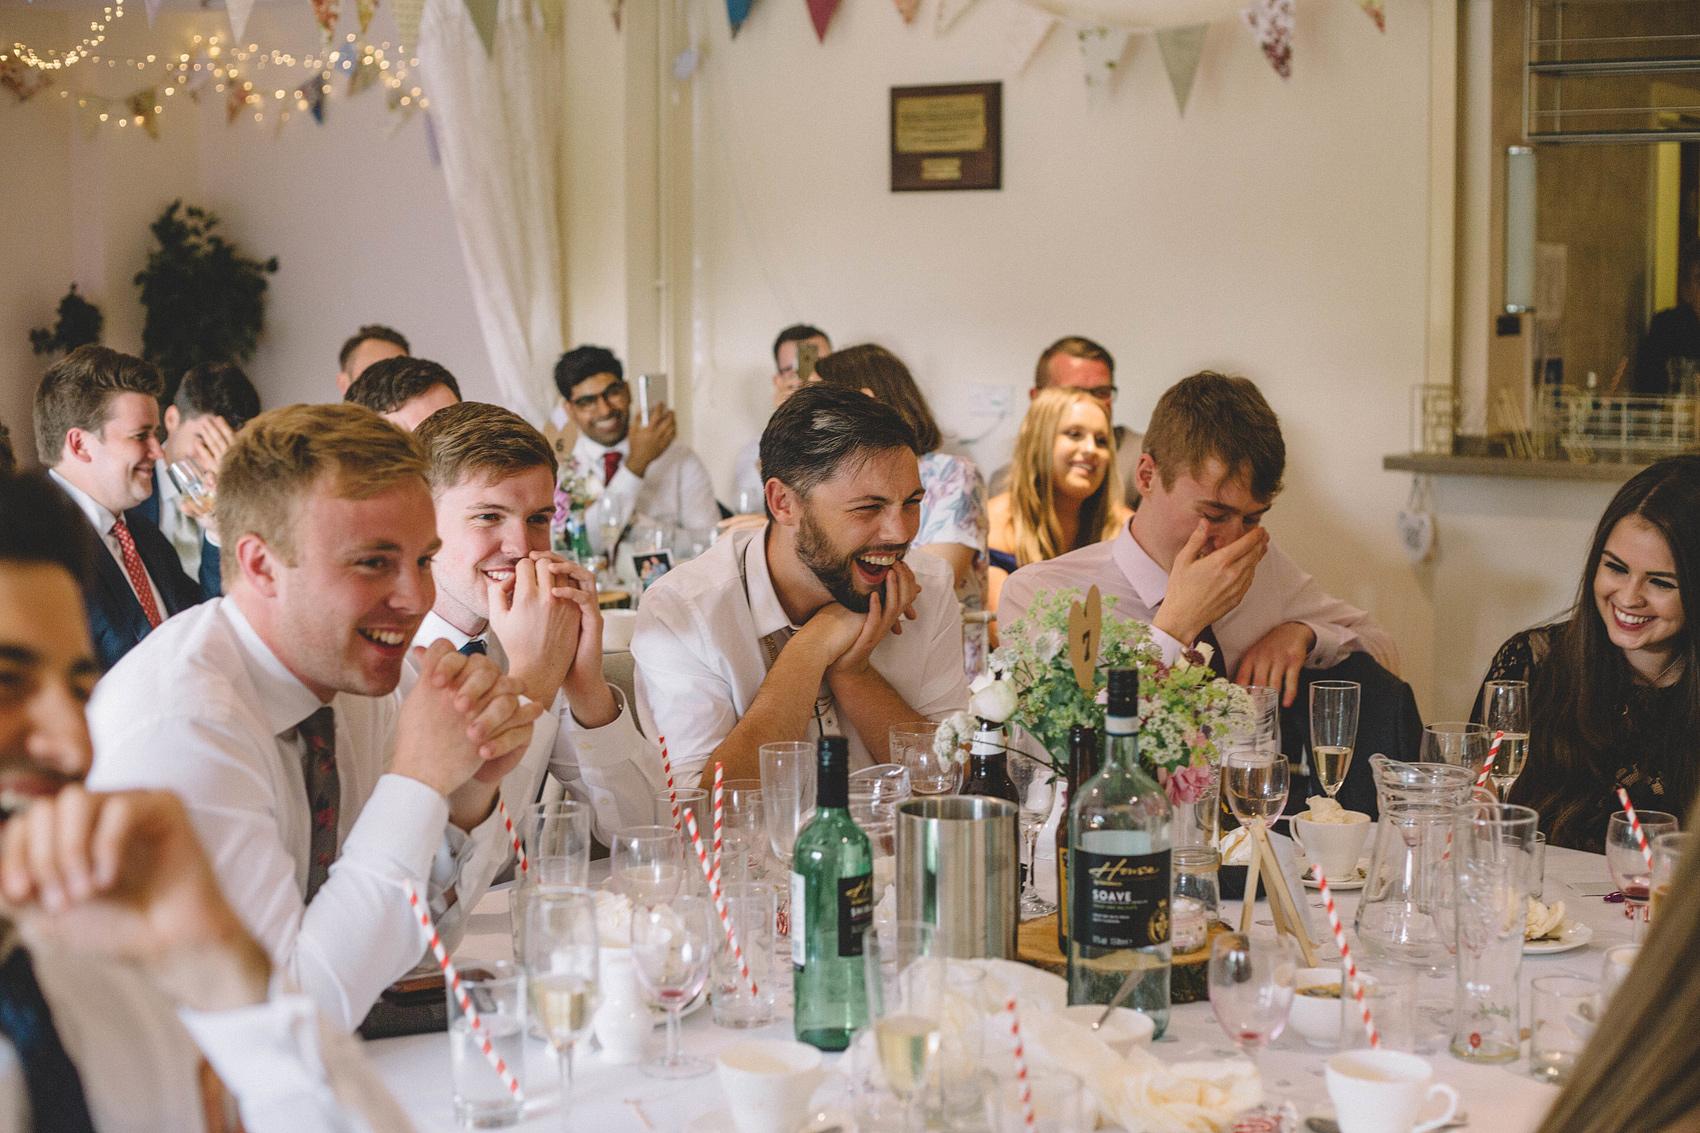 Dilhorne_Village_Hall_Wedding_Photography_-_74_.jpg